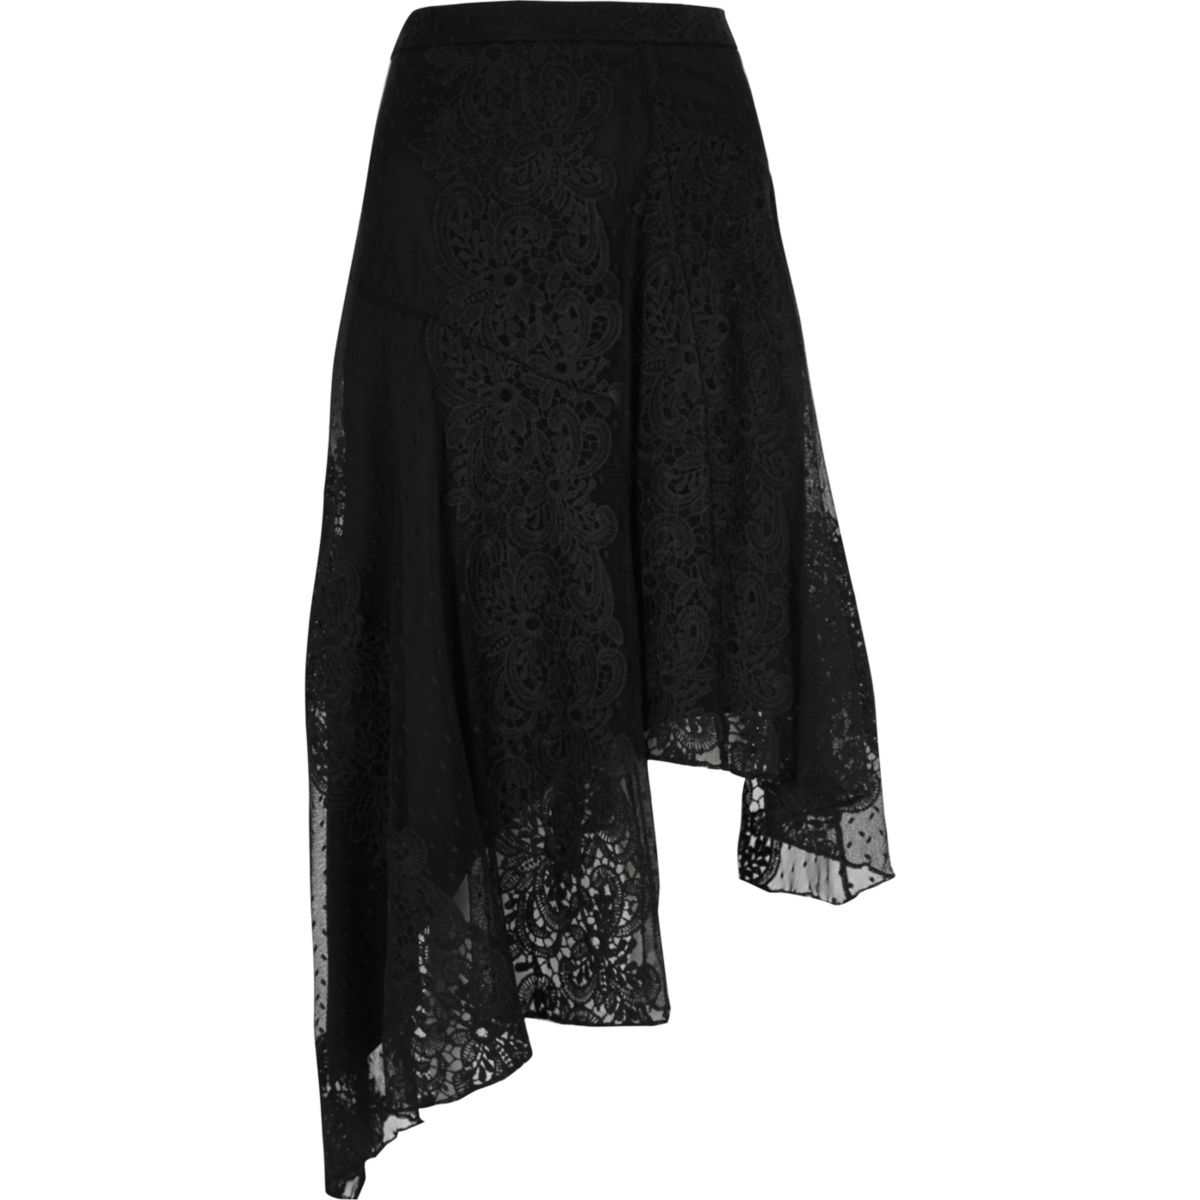 black mesh and lace asymmetric midi skirt skirts sale